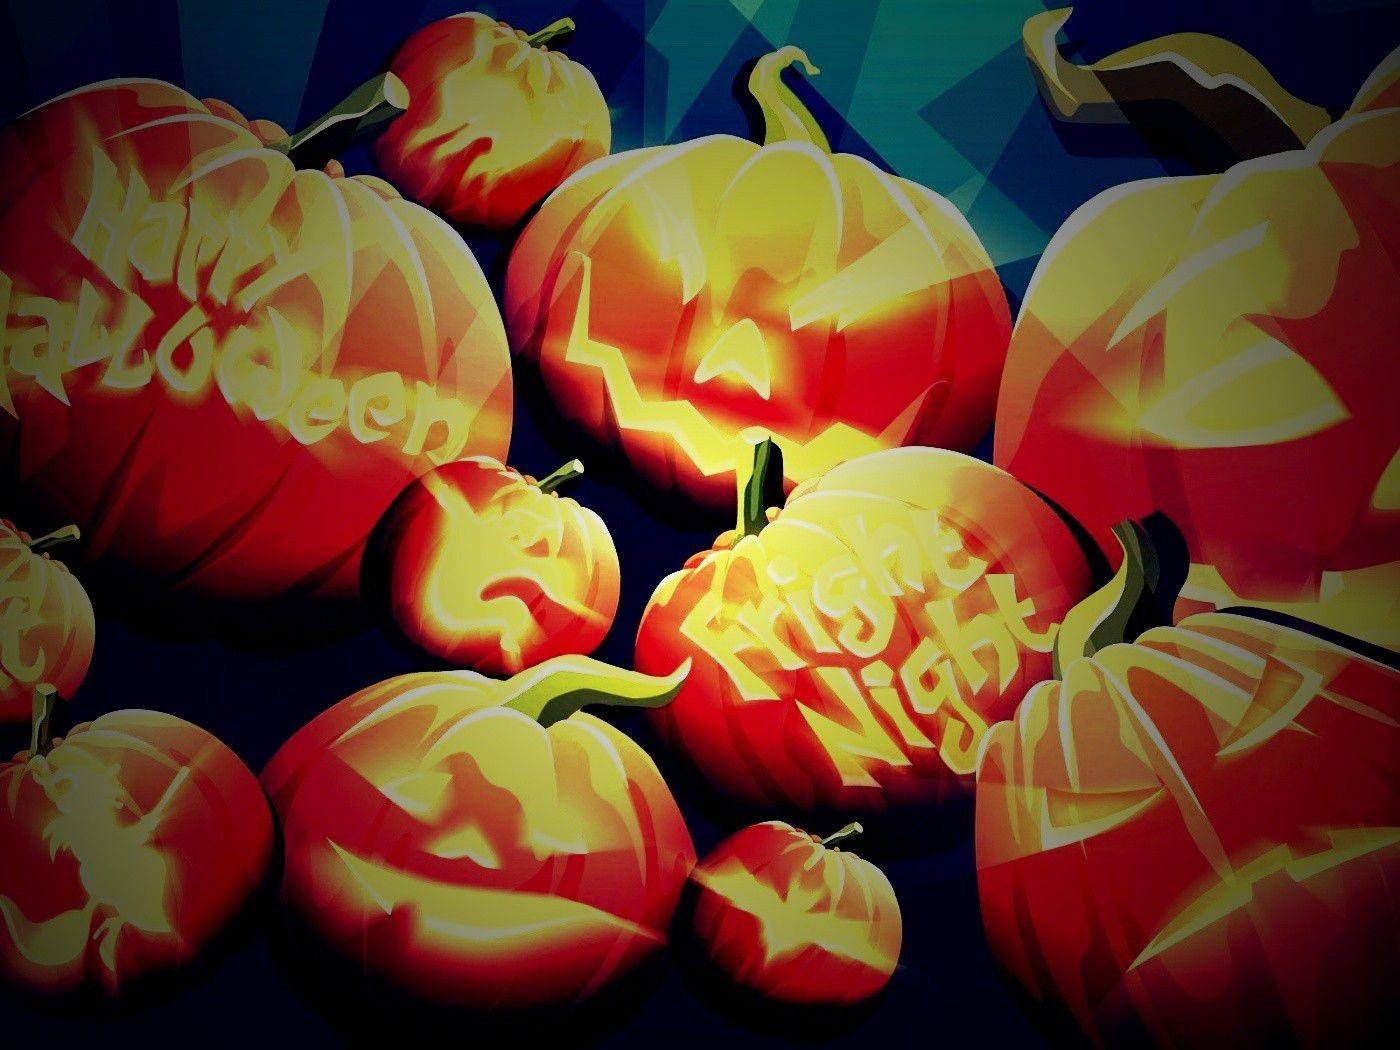 Halloween Fearful Night HD Wallpaper